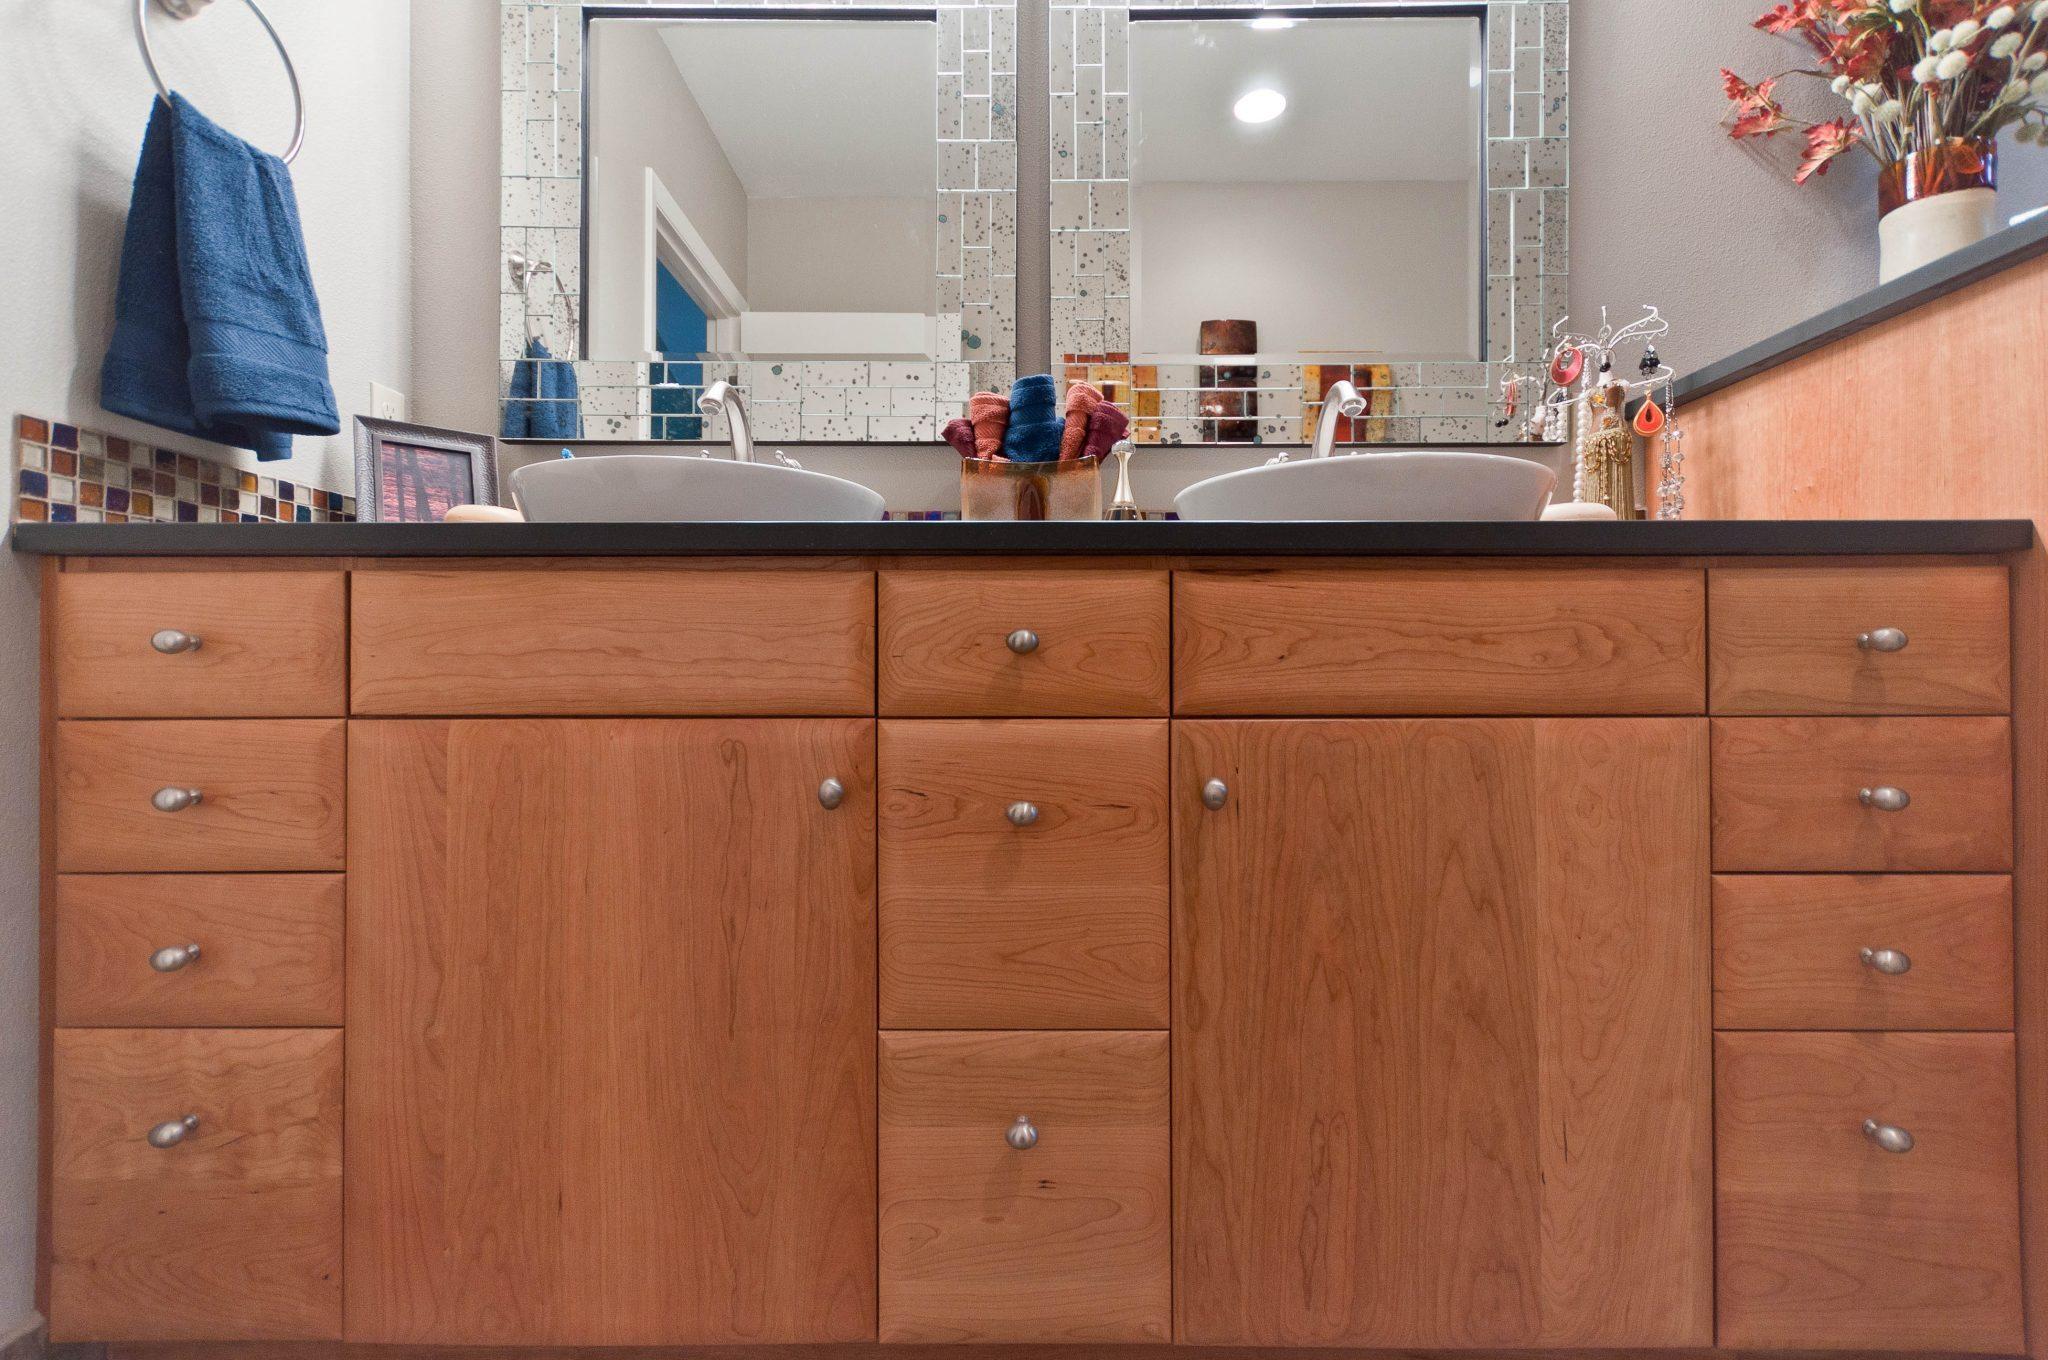 Double Sink Vanity & Cabinetry